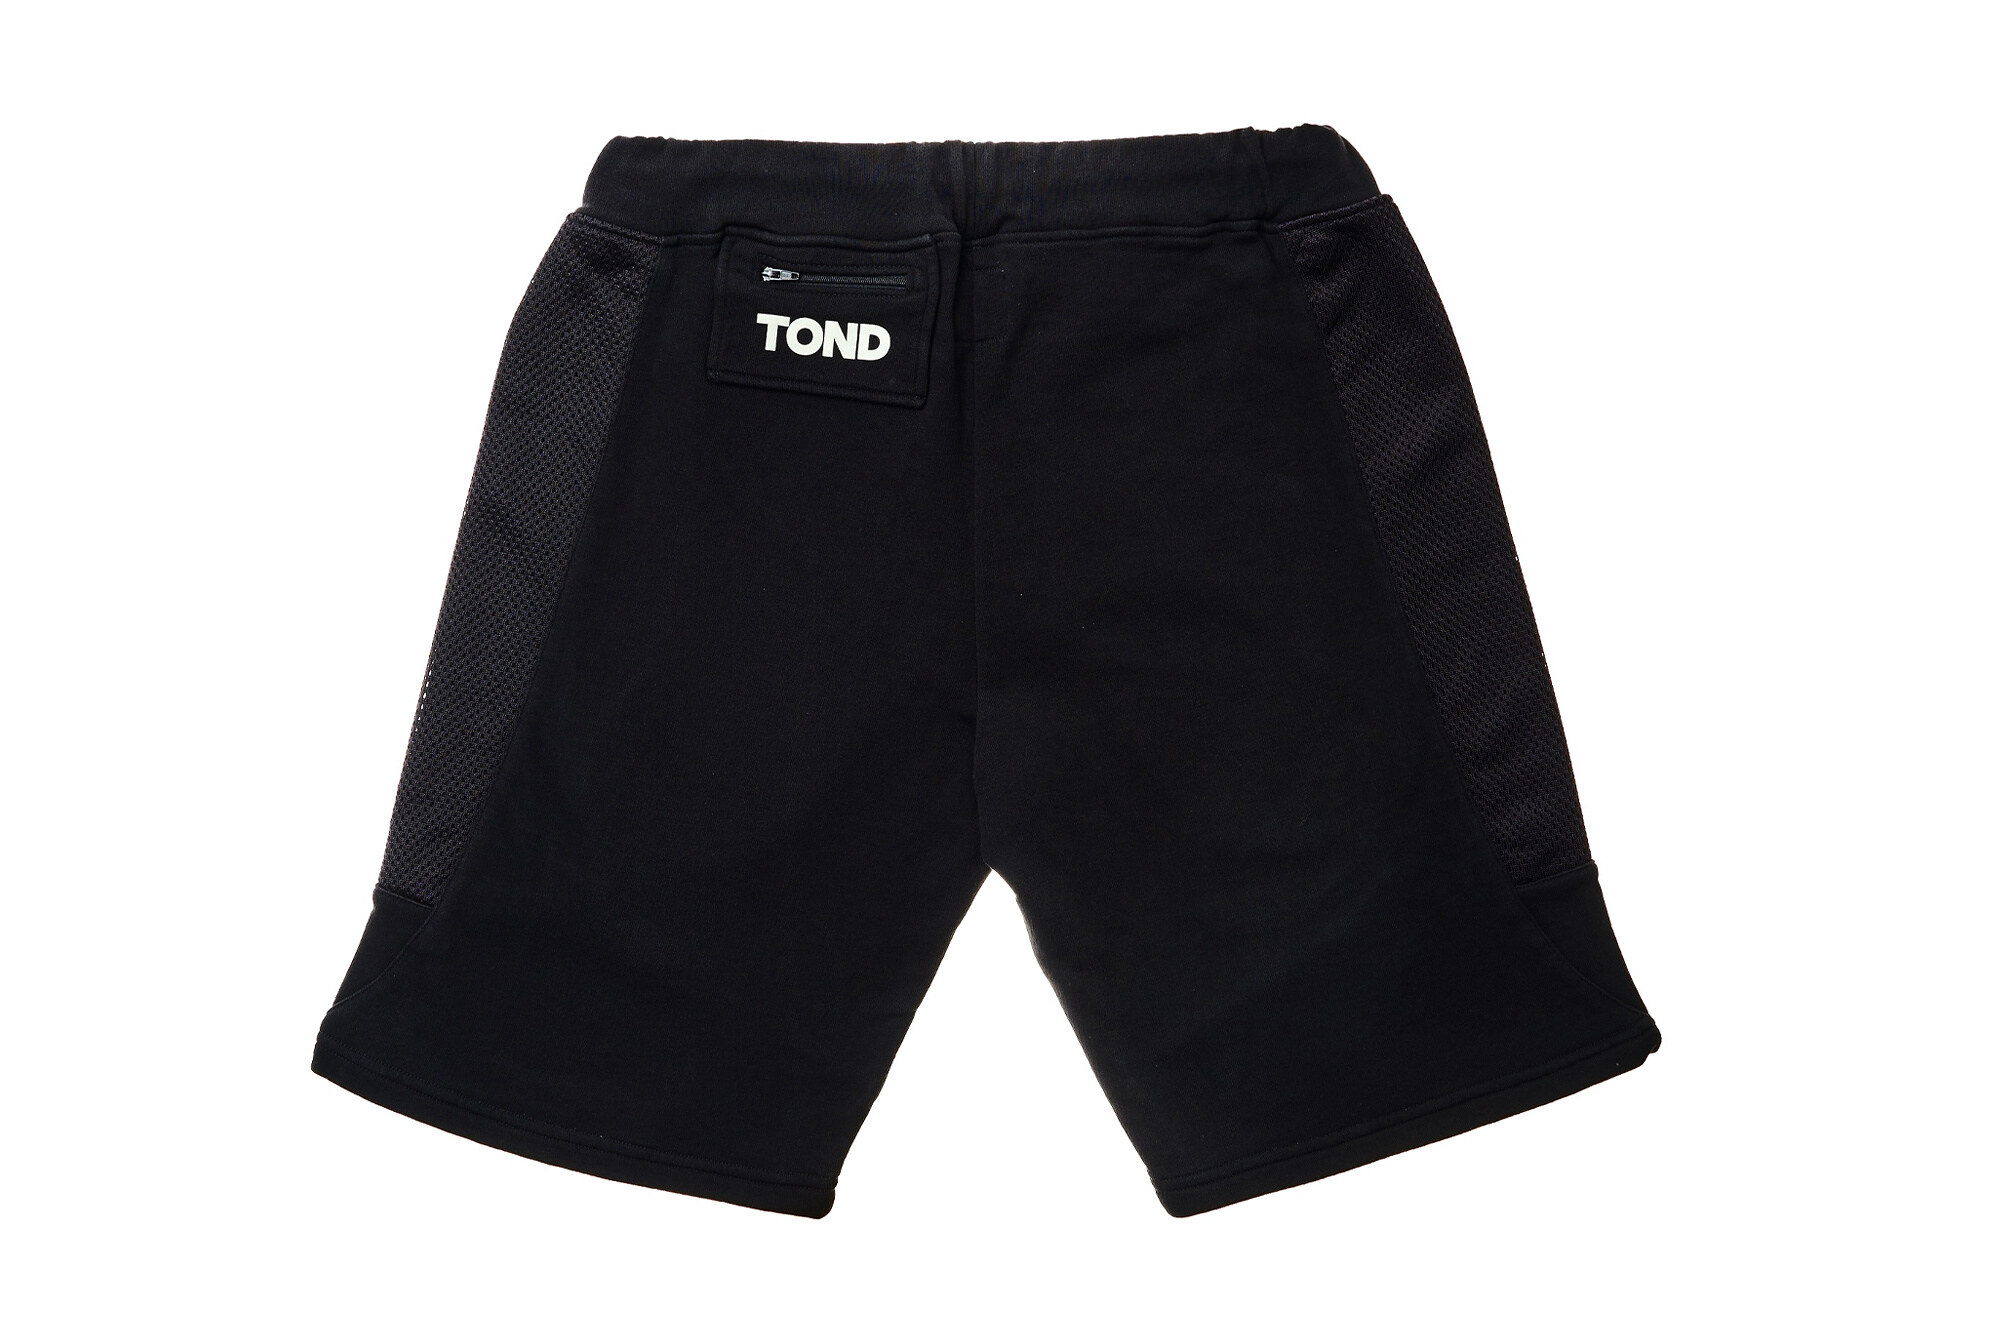 TOND Techno Fluo Athleisure